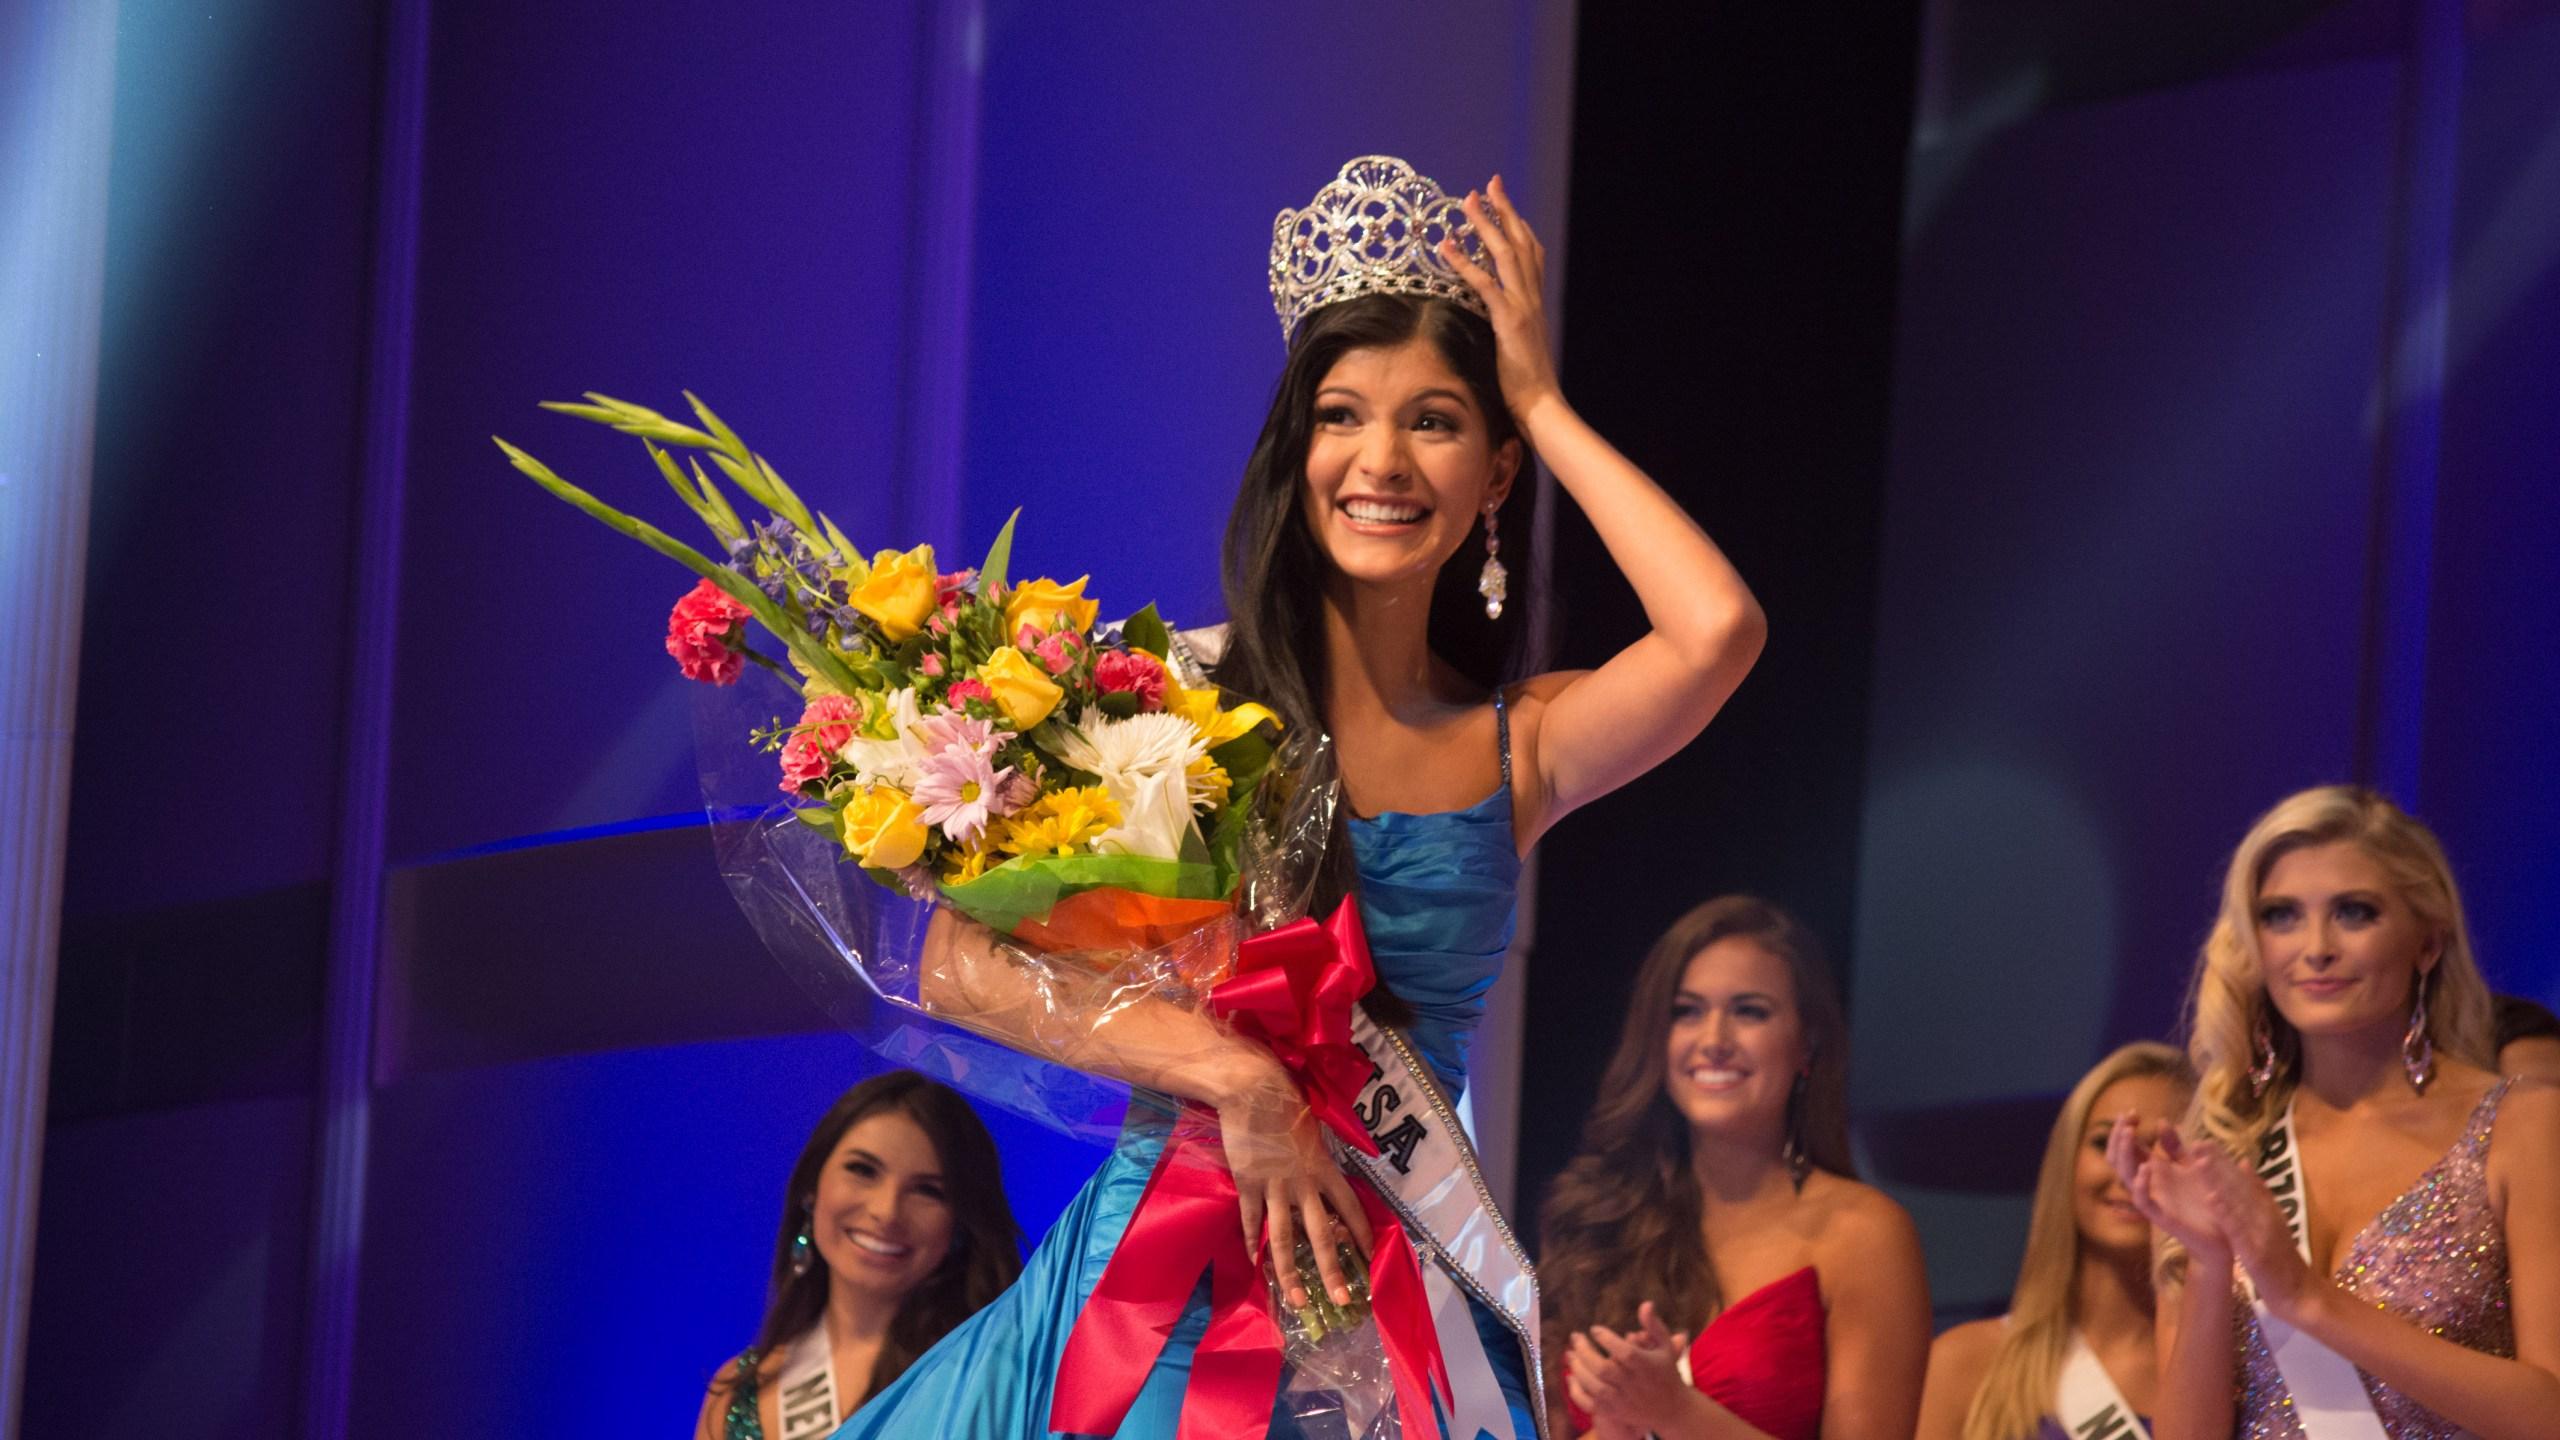 Miss Teen USA_1526652773460.jpg-22991016.jpg